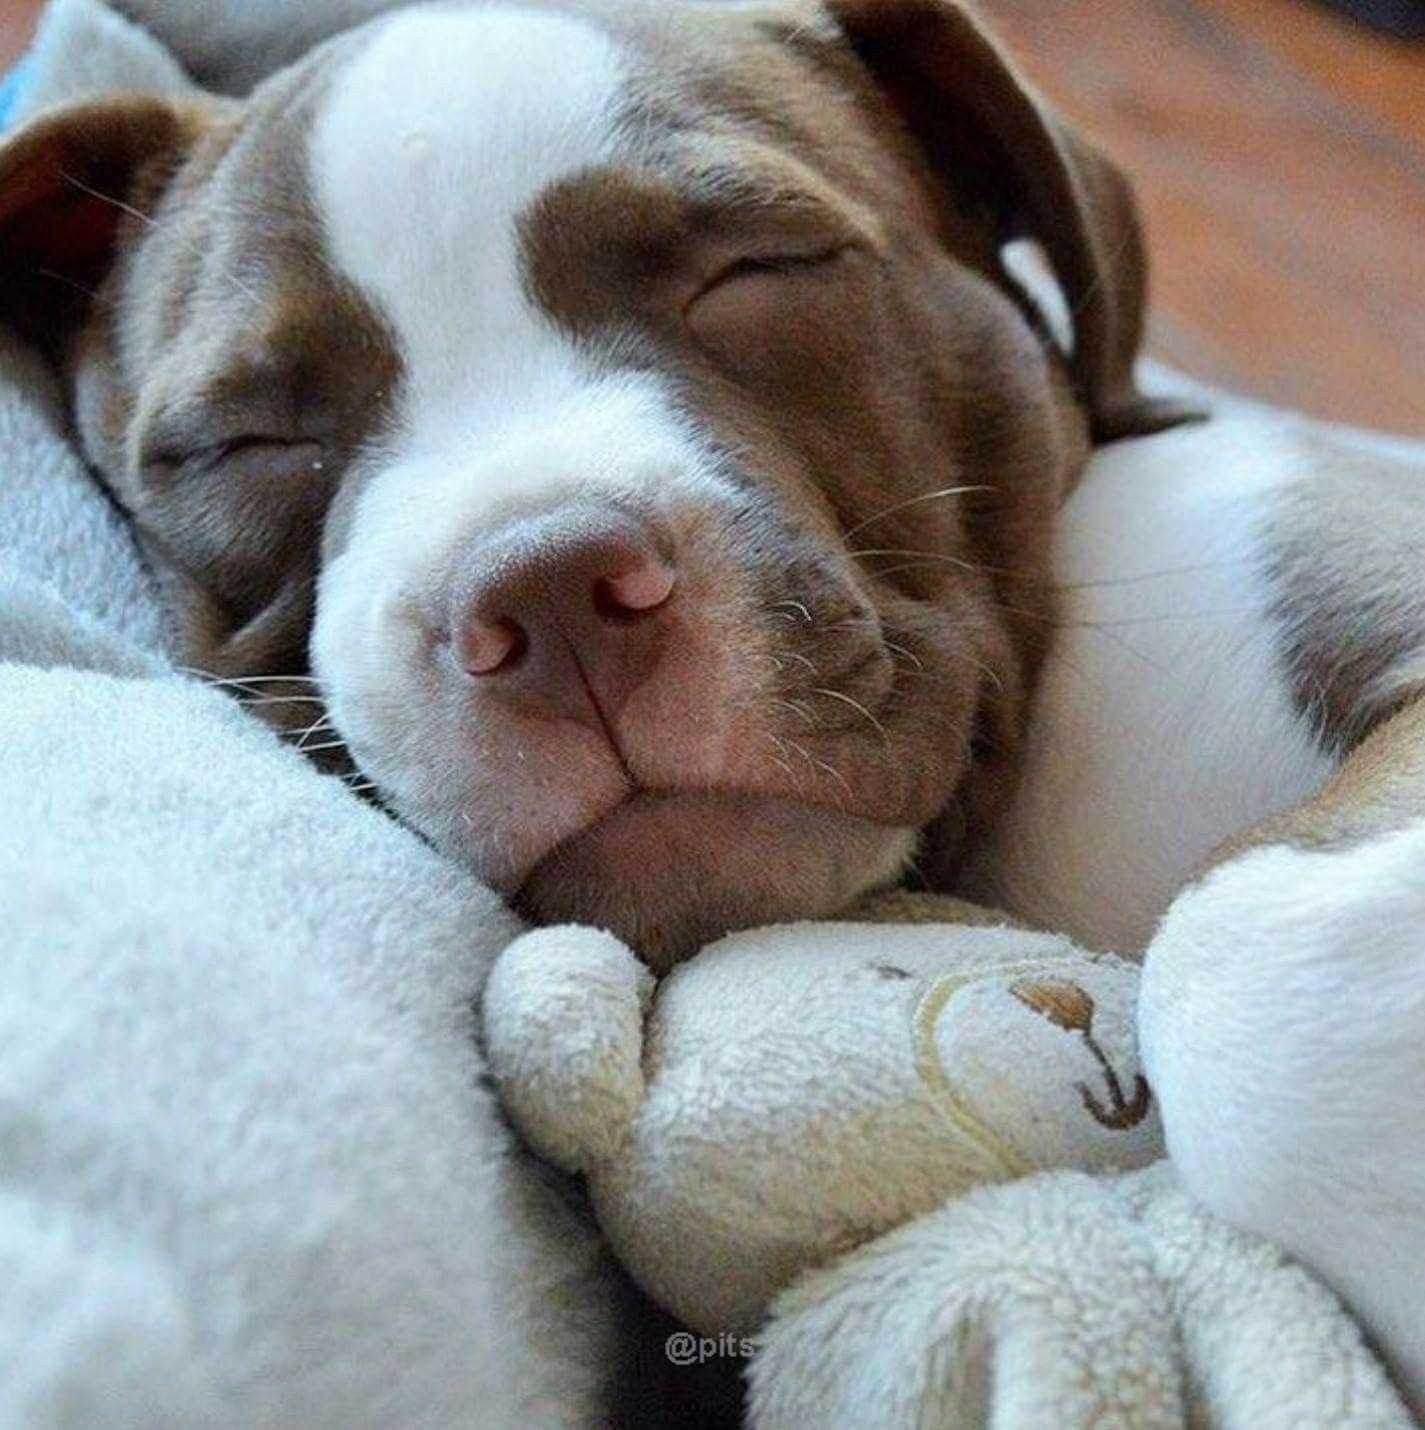 cute, sleeping puppy ~ such a cute face, and snuggling teddy bear